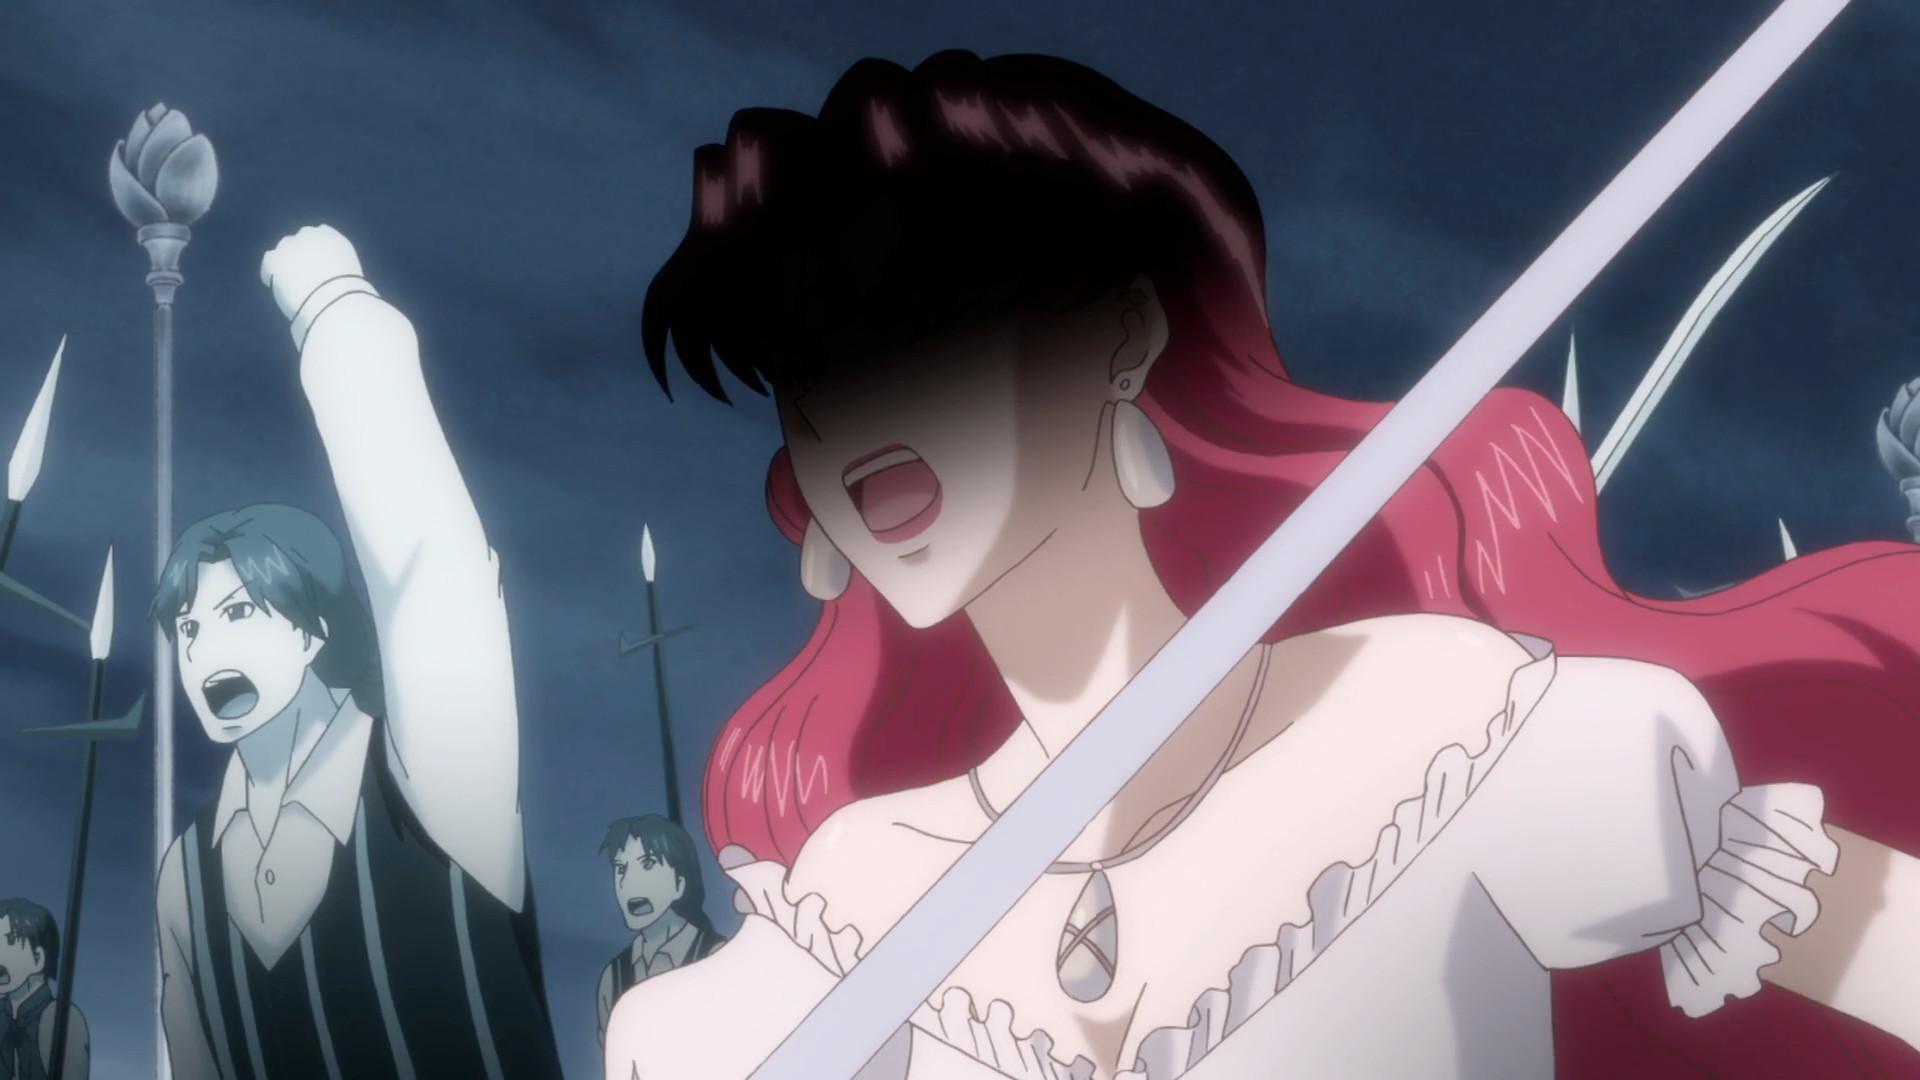 [Theory]Naru's Energy [Spoilers For Original Season 1 Anime] Sailor_moon_crystal_act_9_queen_bery